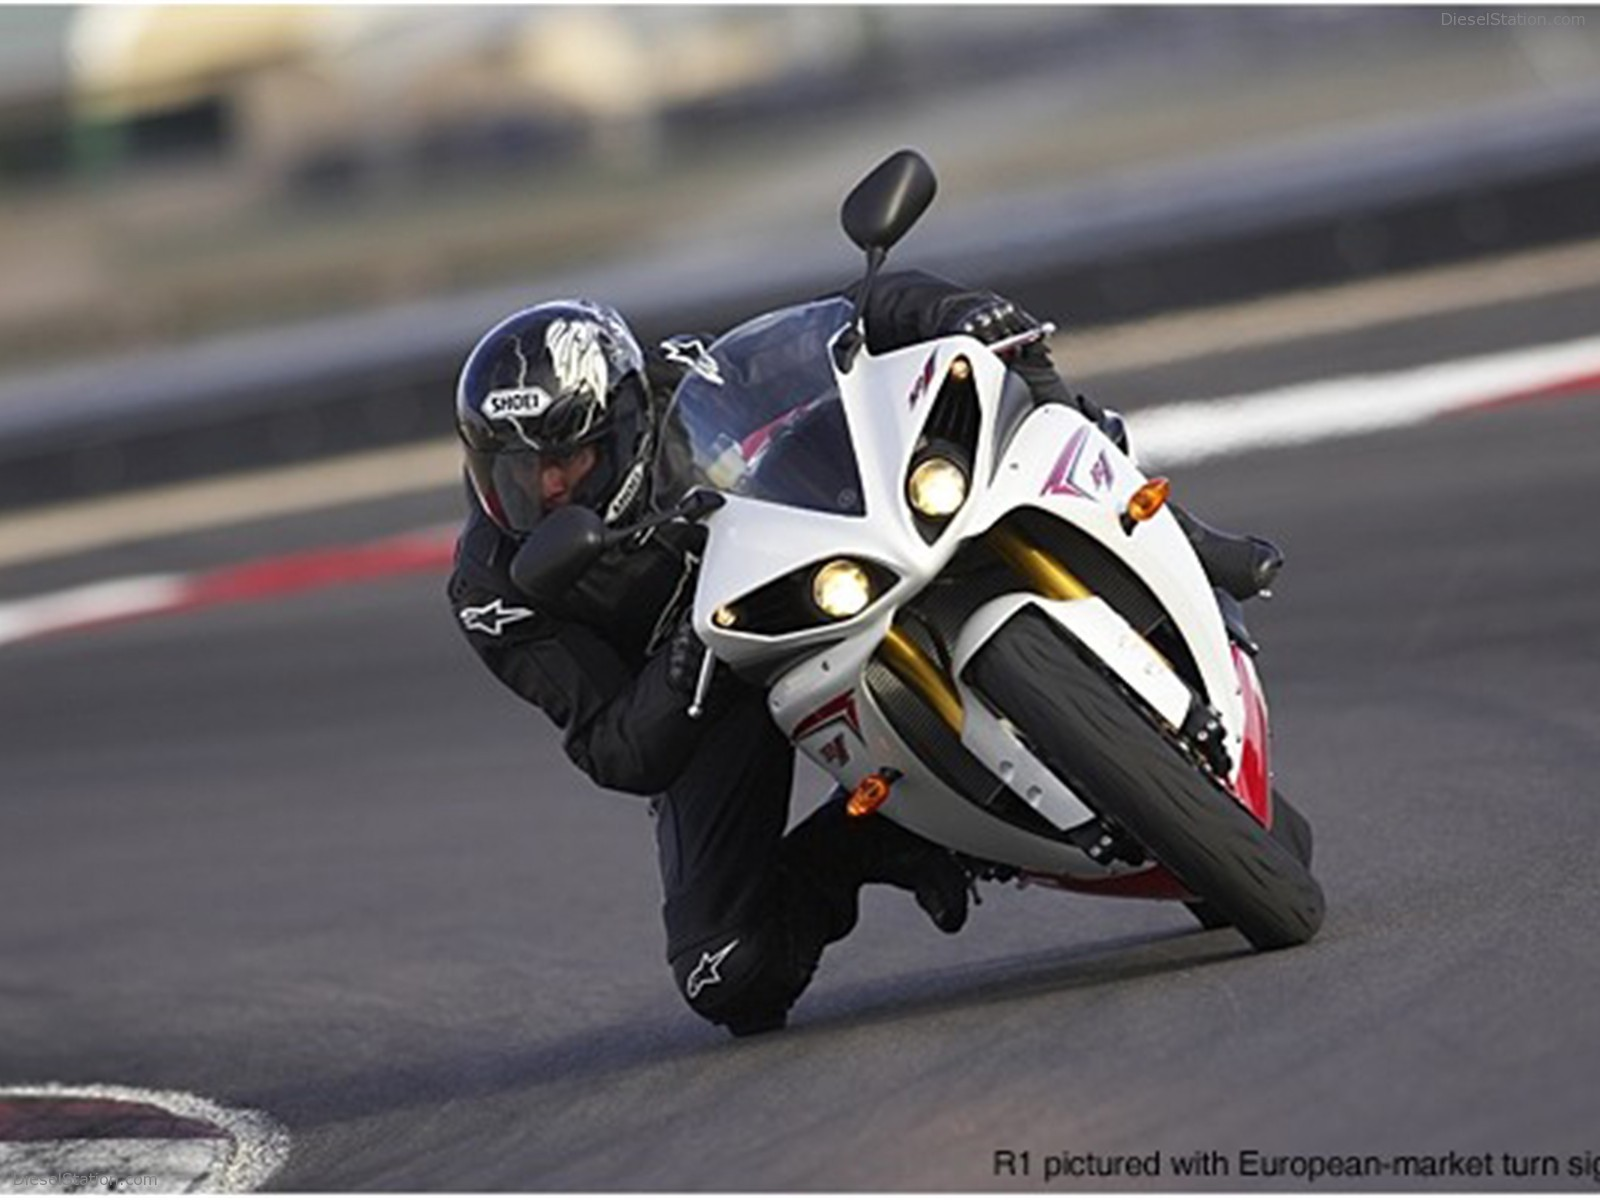 2009 Yamaha R1 Wallpaper 7252 Hd Wallpapers in Bikes   Imagescicom 1600x1200